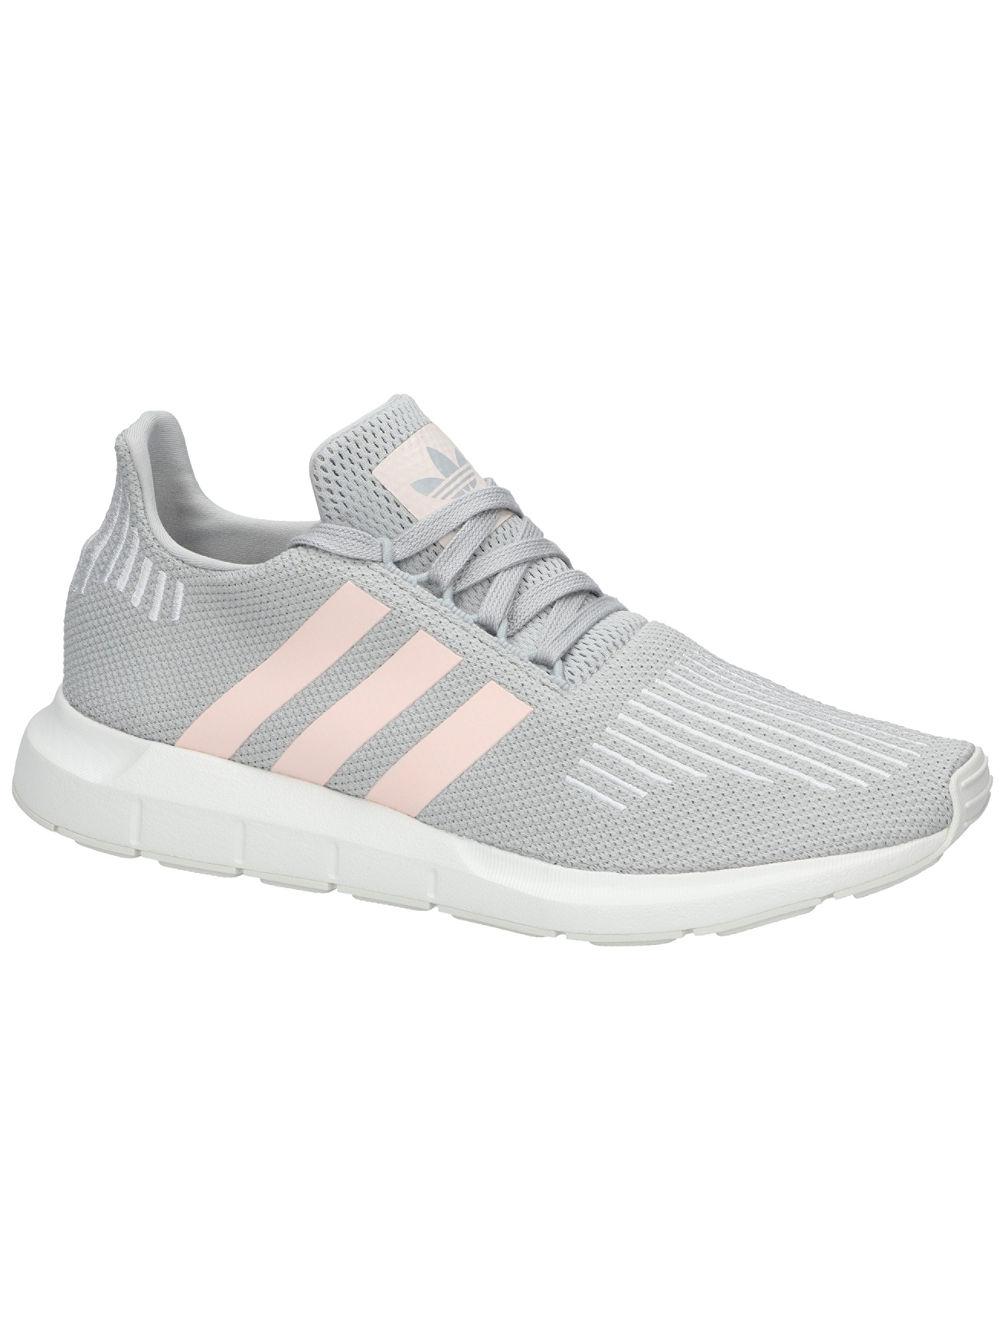 2c7f566c919866 adidas Originals Swift Run W Sneakers Damen online kaufen bei  blue-tomato.com